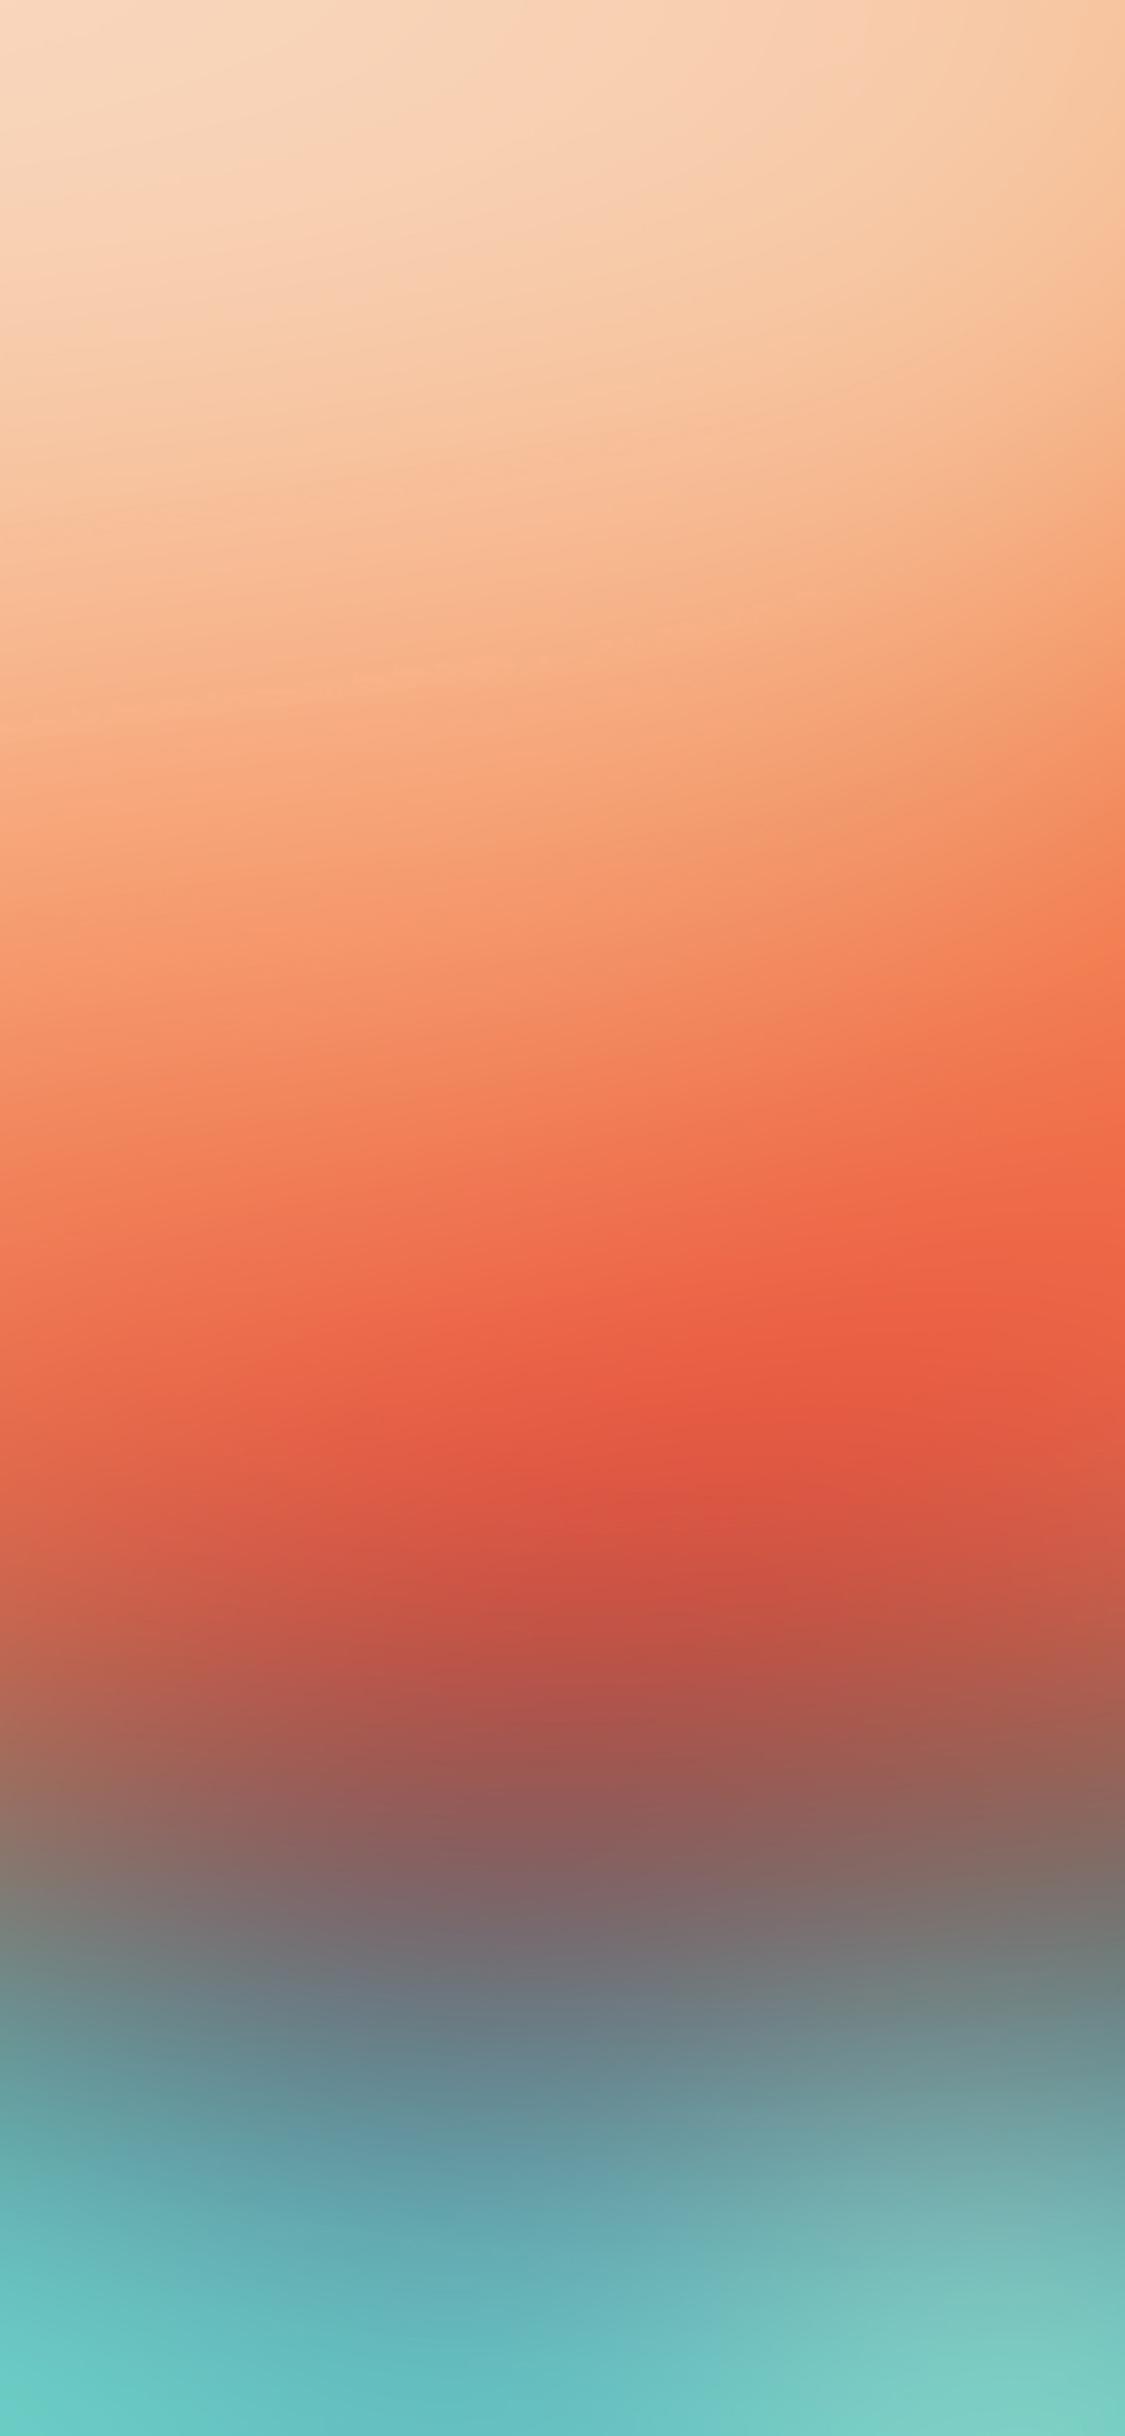 iPhoneXpapers.com-Apple-iPhone-wallpaper-sc01-pink-cyan-green-blur